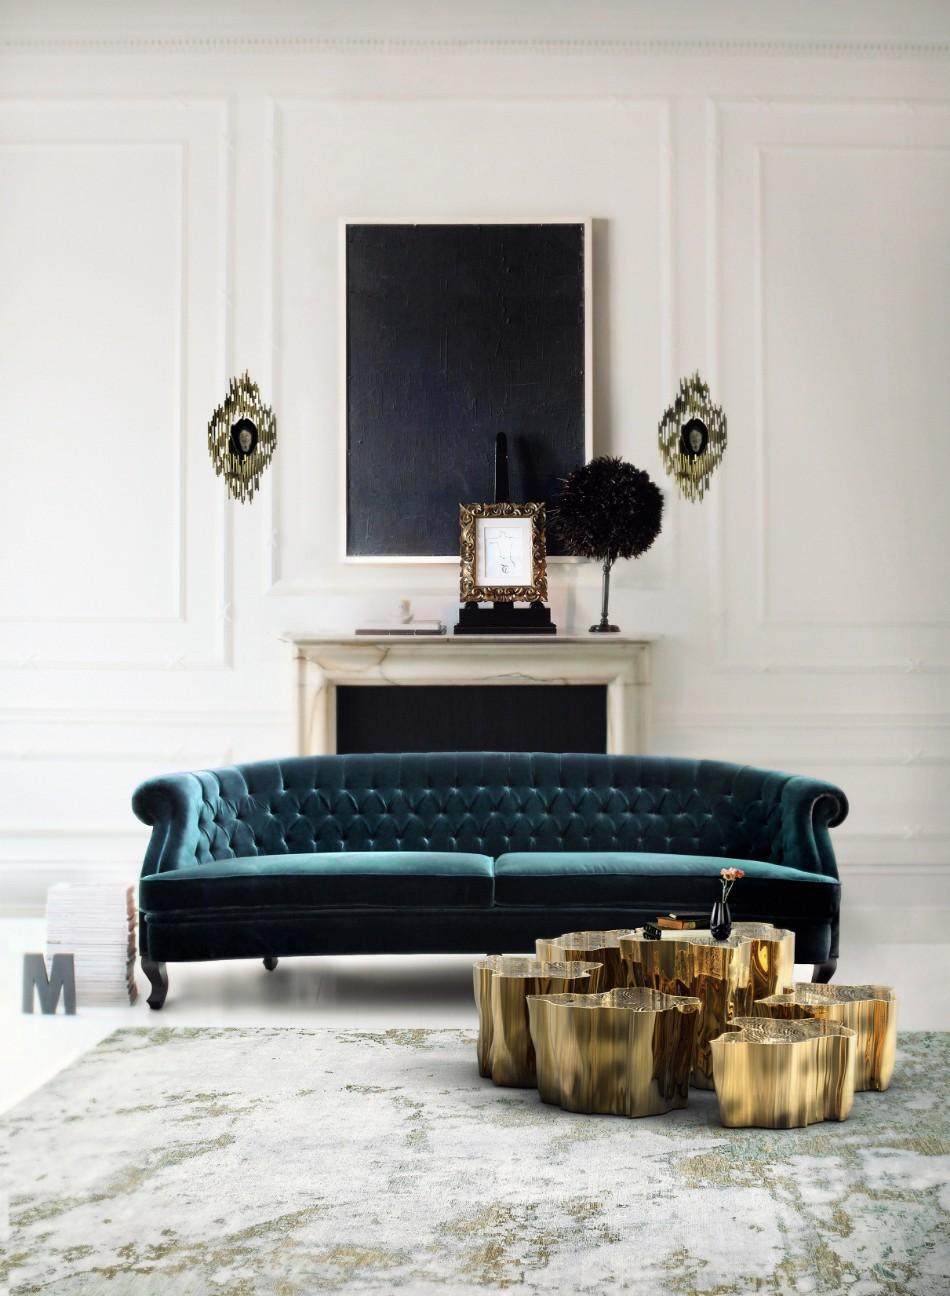 10 Luxury Sofas That Will Shine Next To Your Coffee Table | www.bocadolobo.com #luxurysofa #livingroom #coffeeandsidetables #luxurybrands #luxuryfurniture #famousbrands